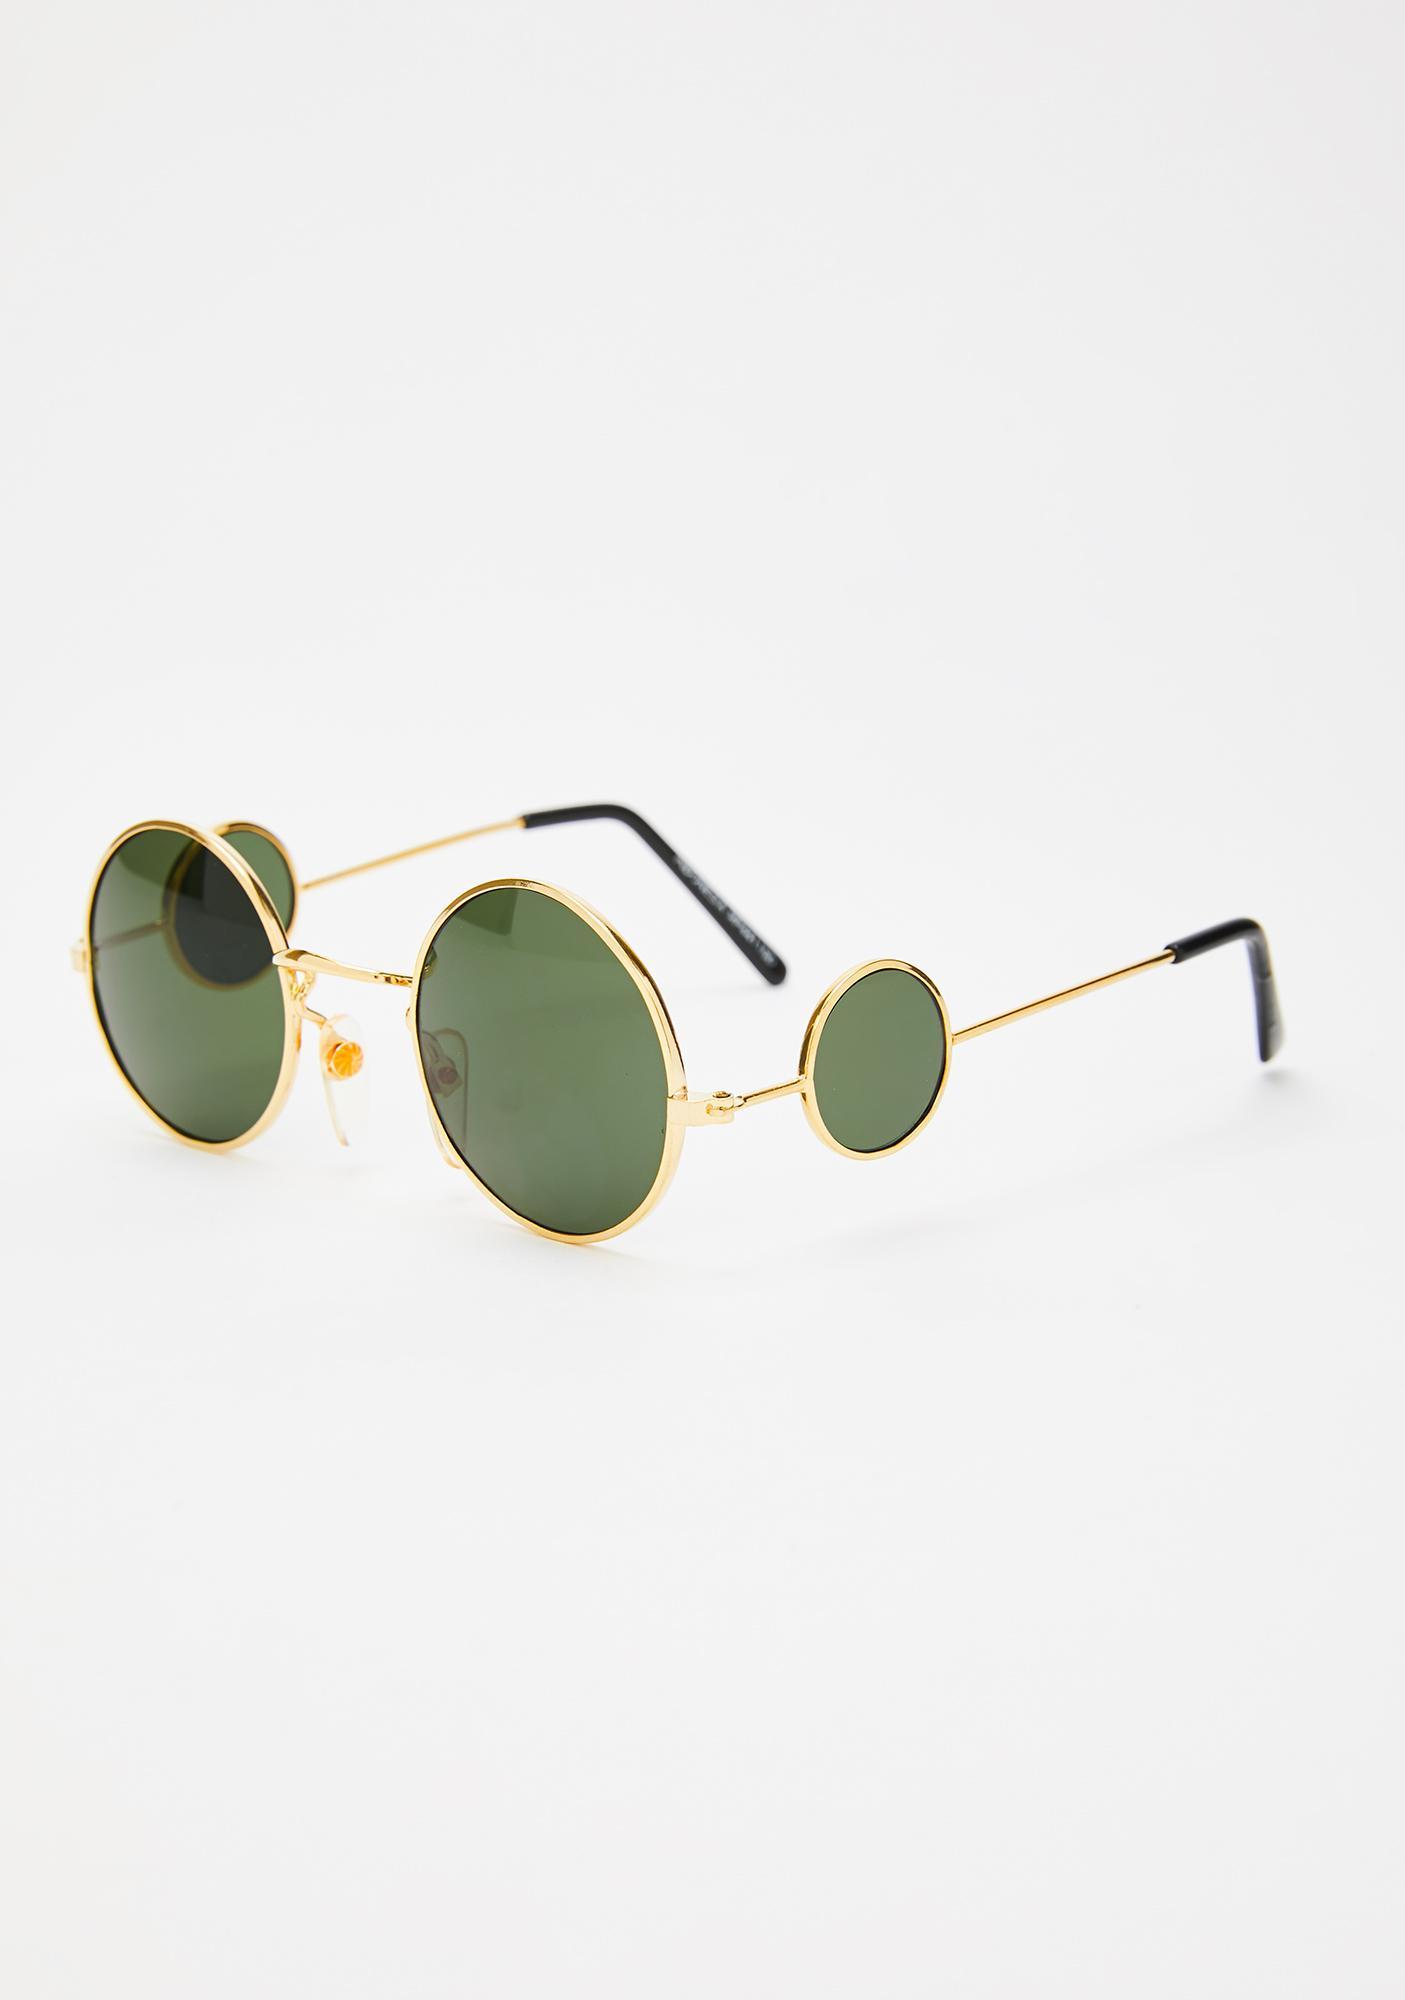 Giant Vintage Golden The Dawn Sunglasses